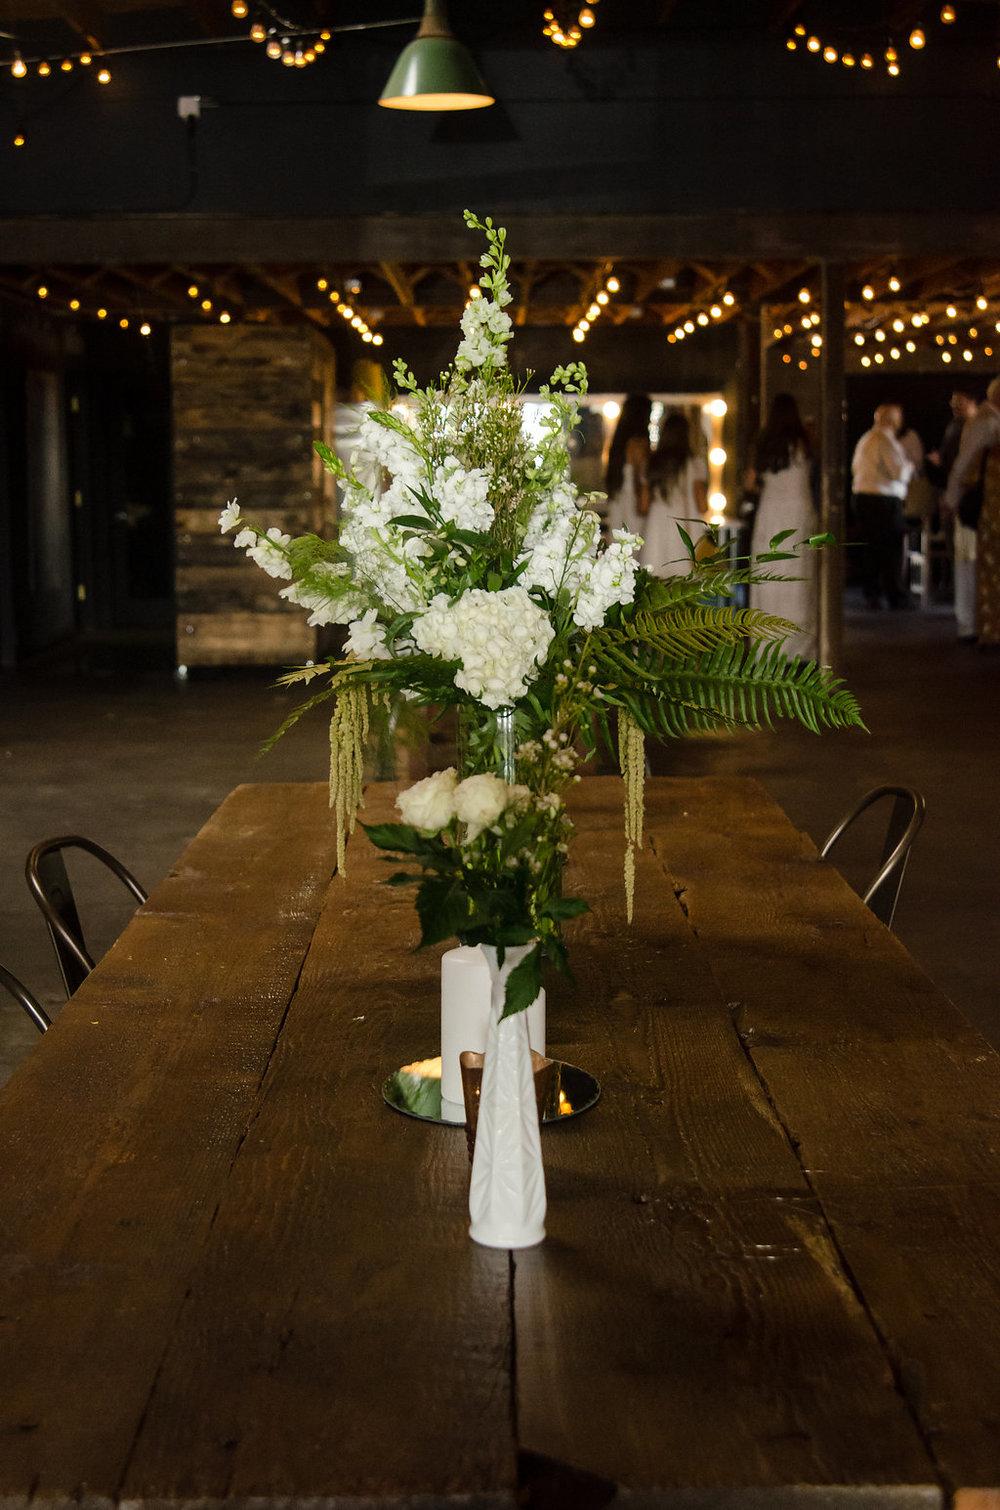 justin-taylor-wedding-table-flowers-sheryl-bale-photography.jpg.jpg